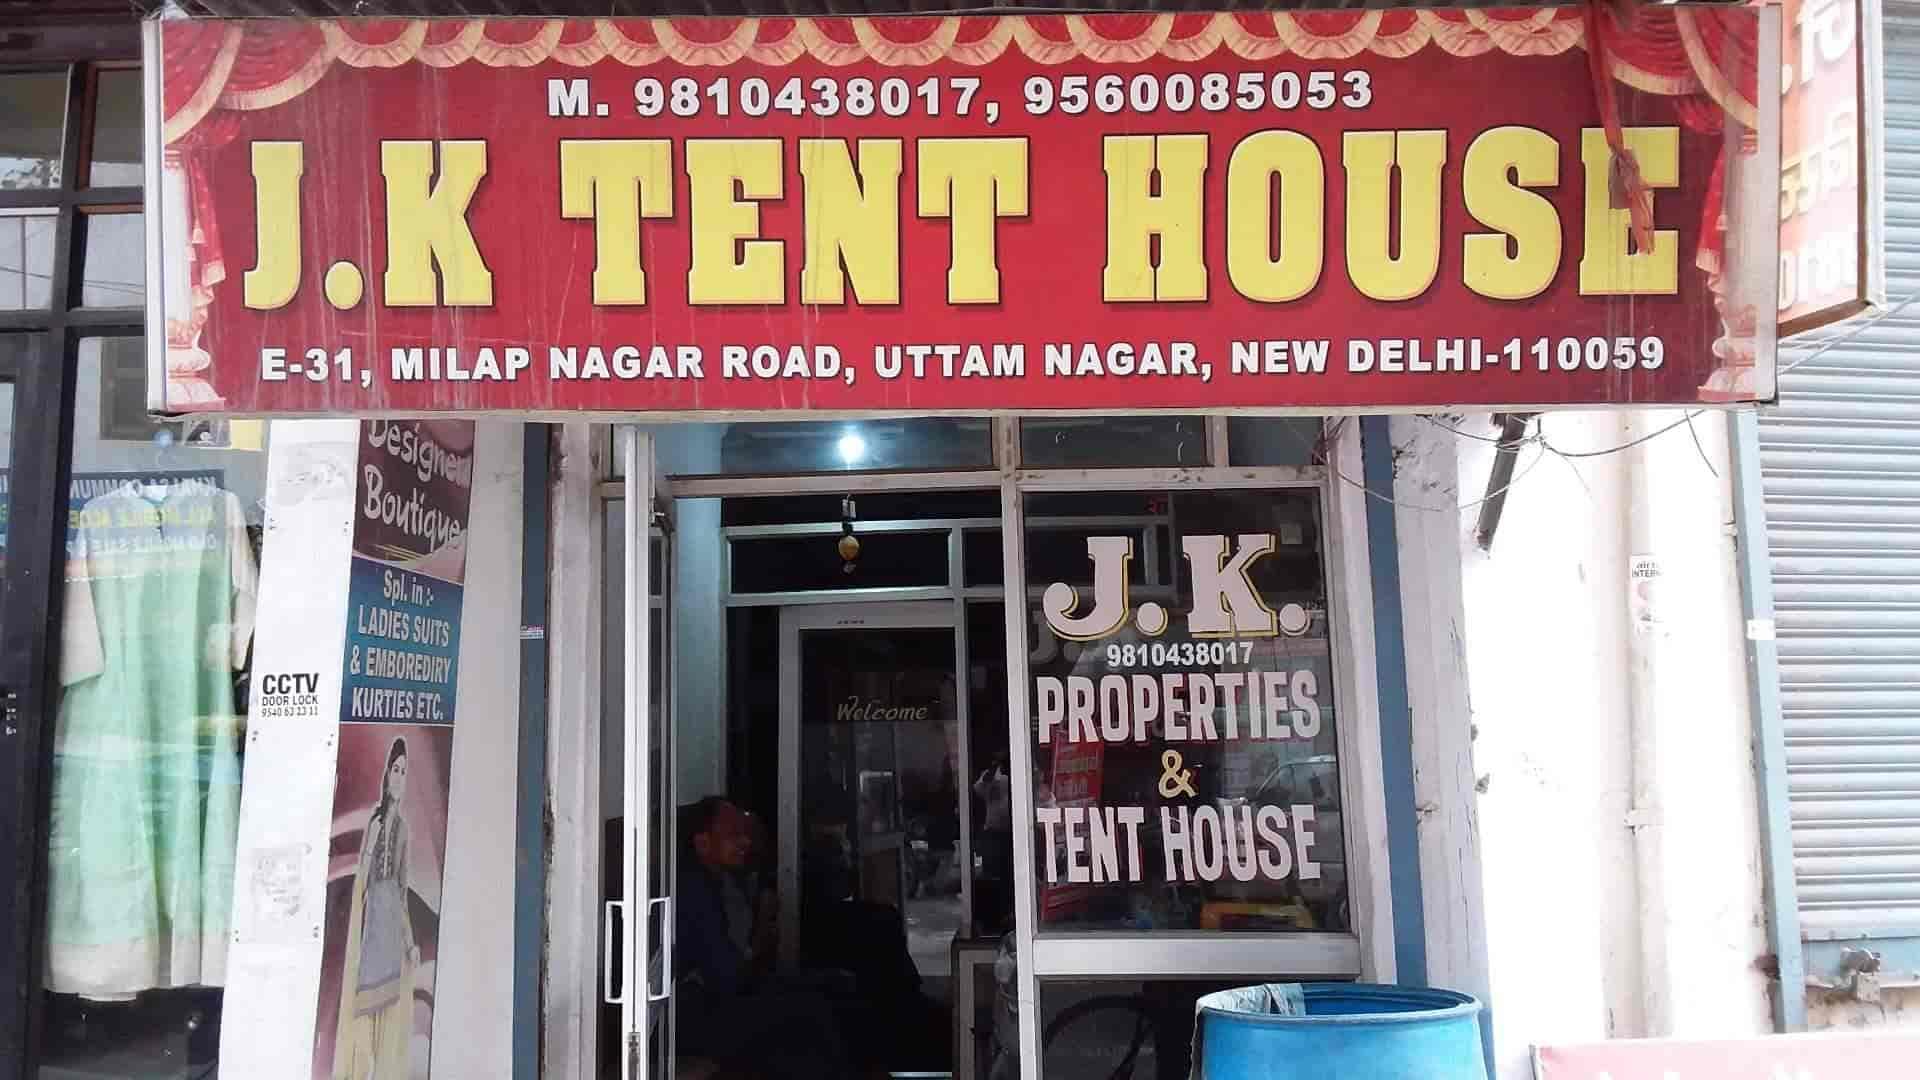 Jk Tent House Decorator Photos Uttam Nagar Delhi- Pictures u0026 Images Gallery - Justdial & Jk Tent House Decorator Photos Uttam Nagar Delhi- Pictures ...